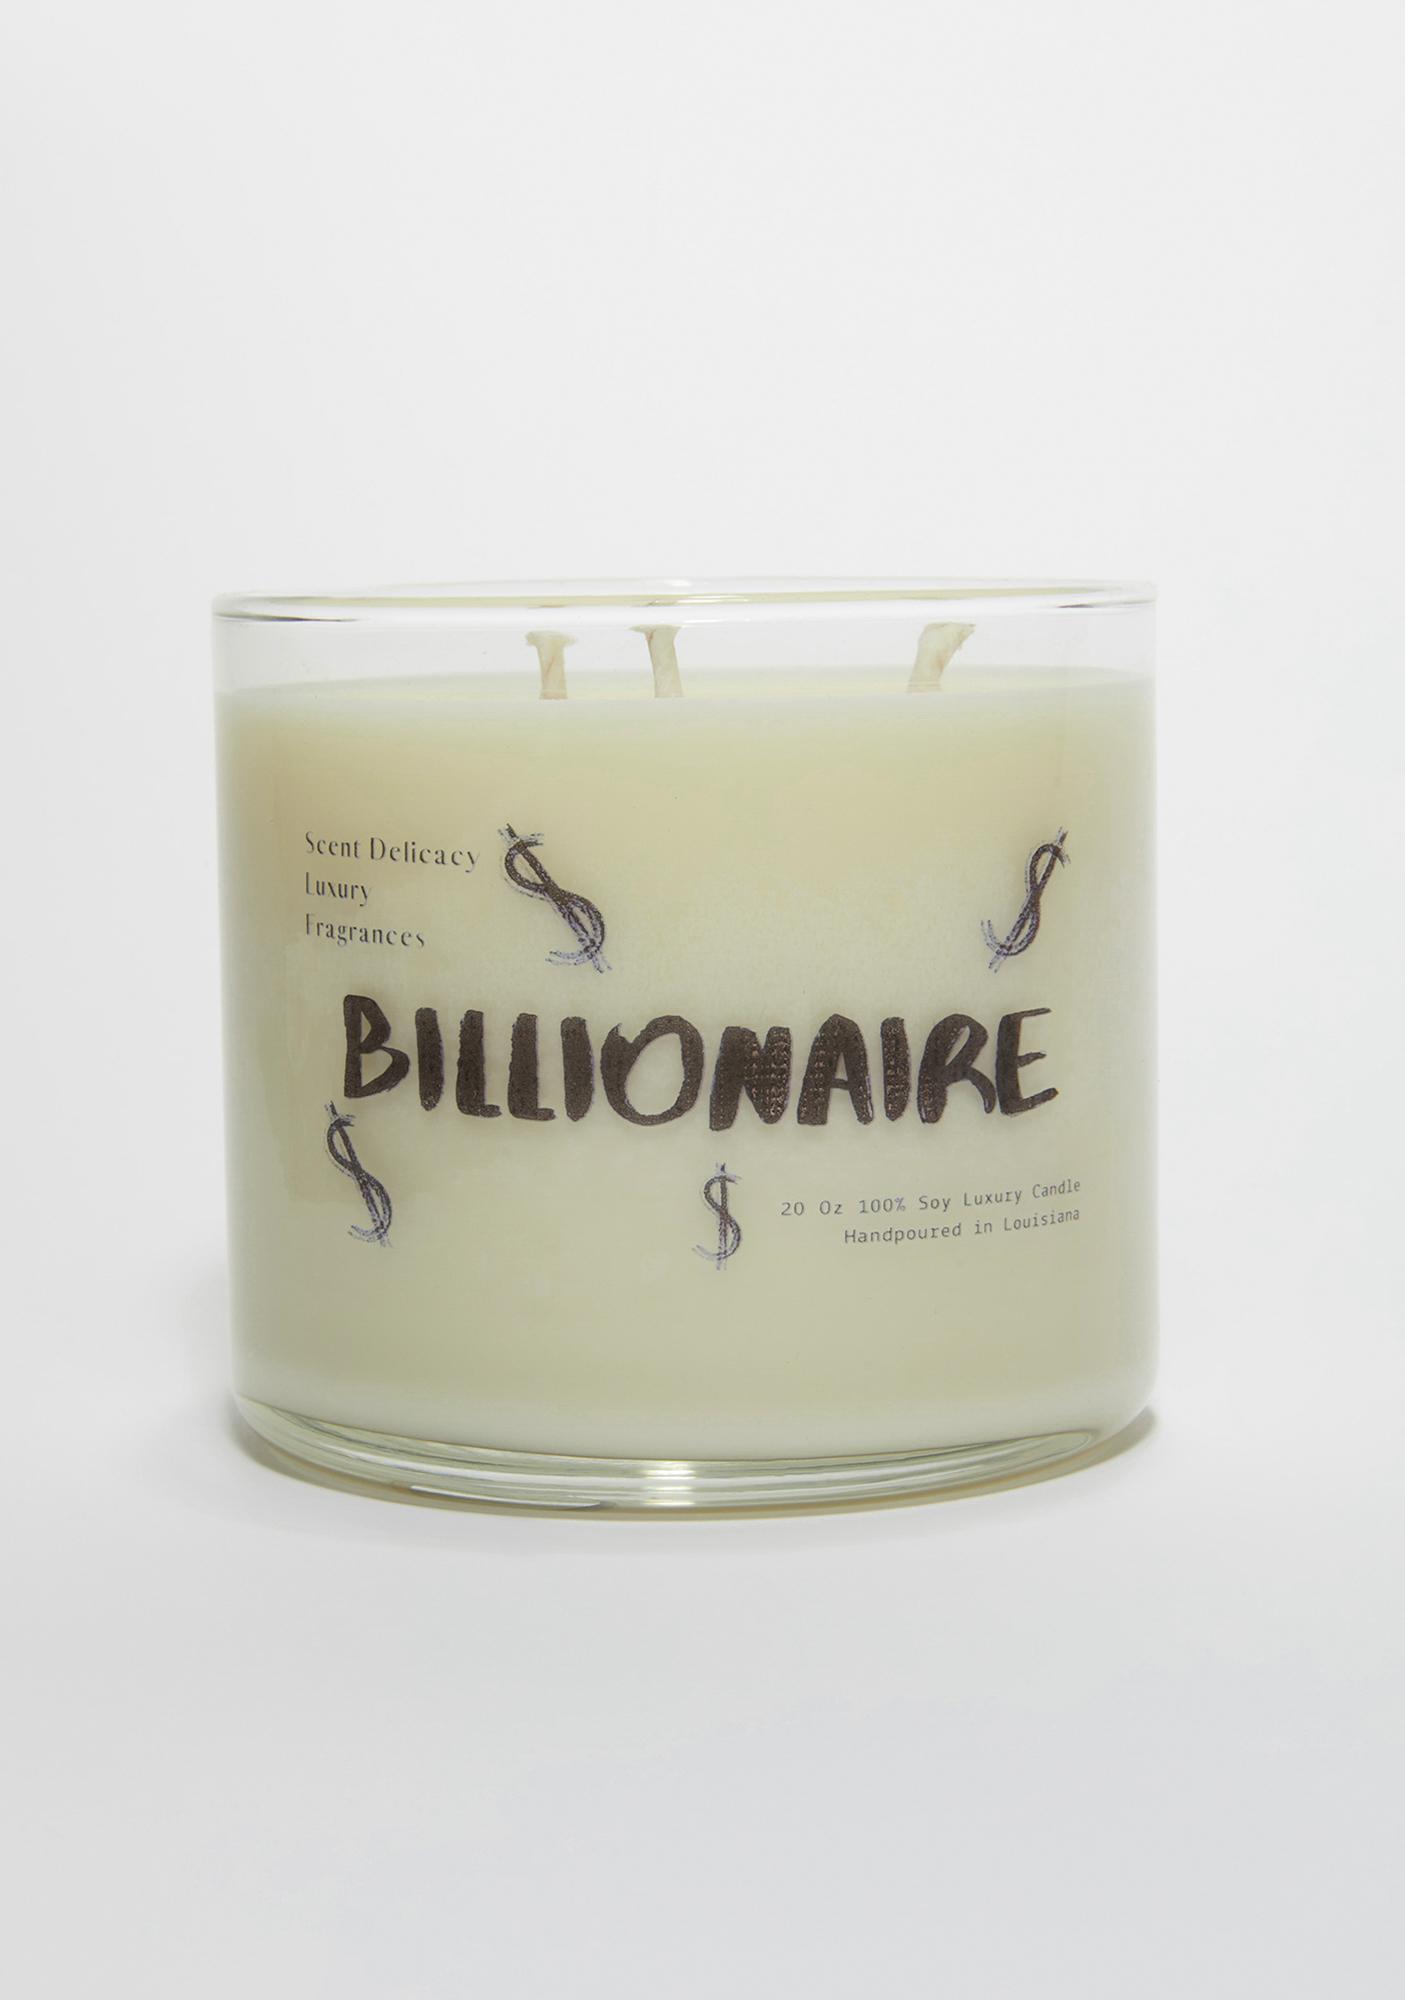 Scent Delicacy Billionaire Signature Collection 3 Wick Candle